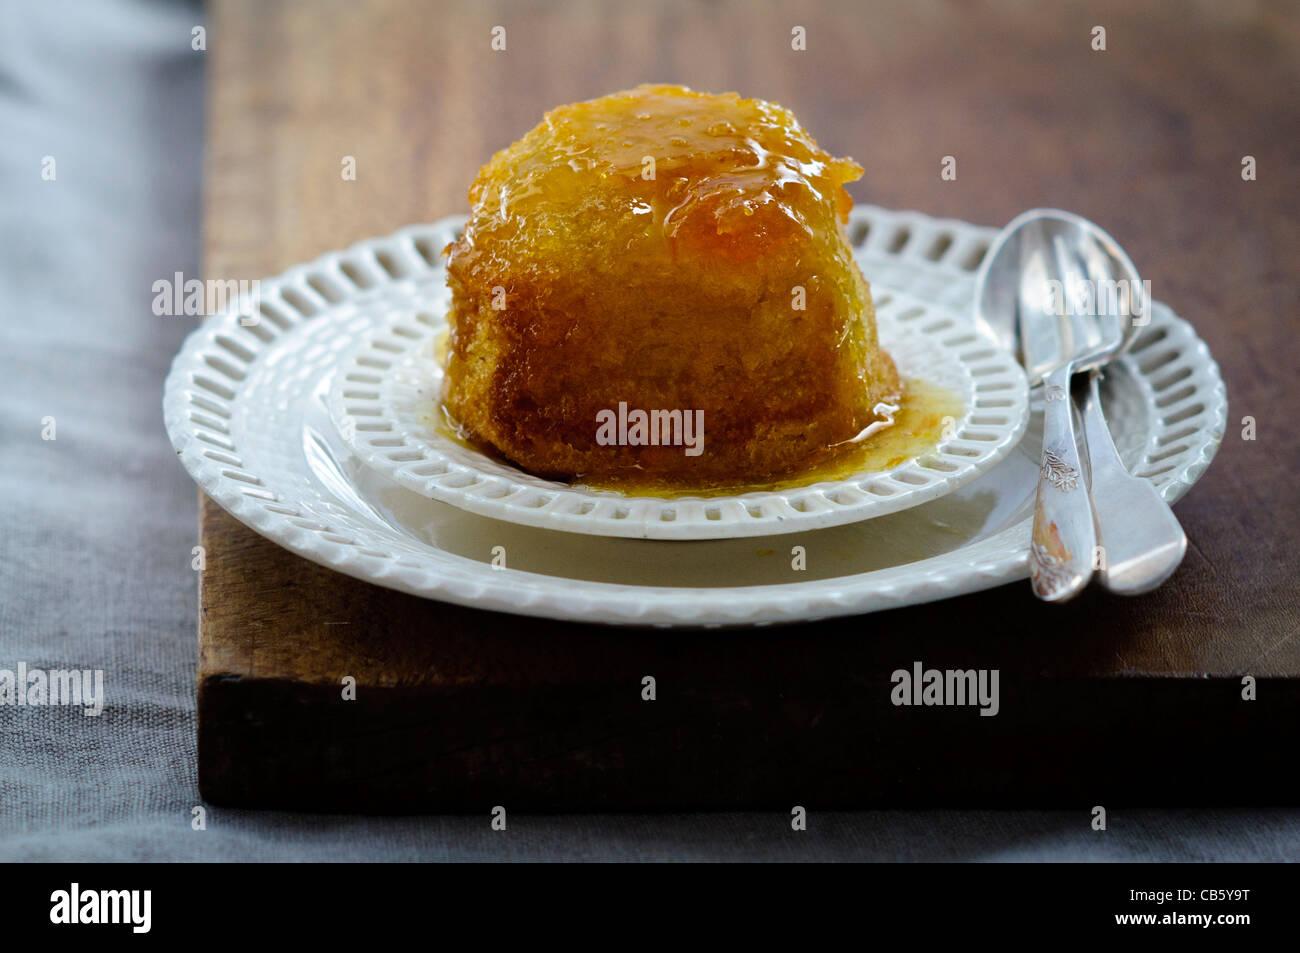 gerne St Clements Pudding auf Creme Band Platten mit Vintage Besteck. Stockbild